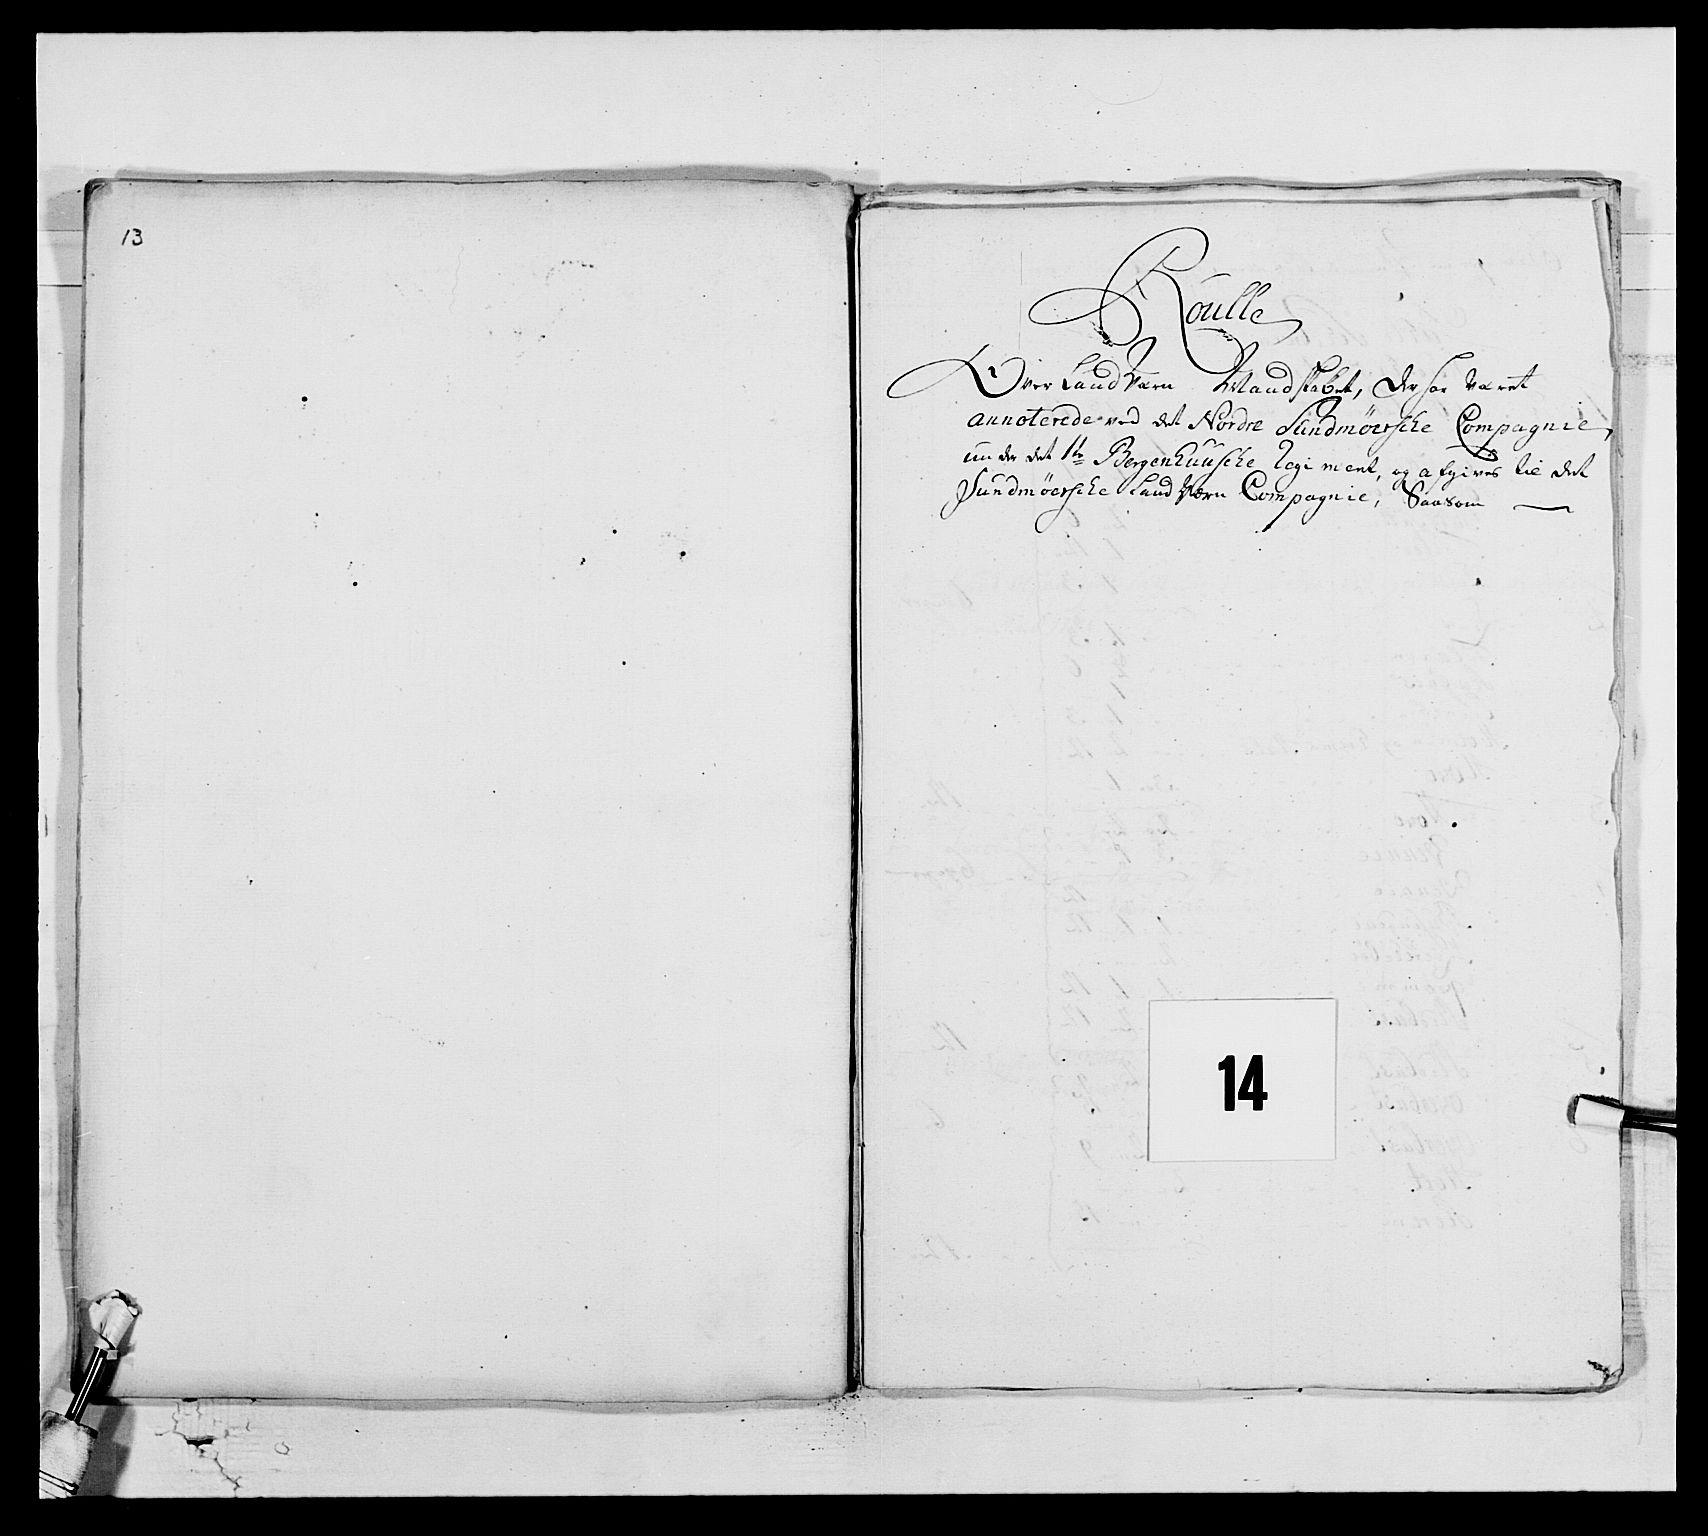 RA, Kommanderende general (KG I) med Det norske krigsdirektorium, E/Ea/L0517: 1. Bergenhusiske regiment, 1742-1756, s. 121